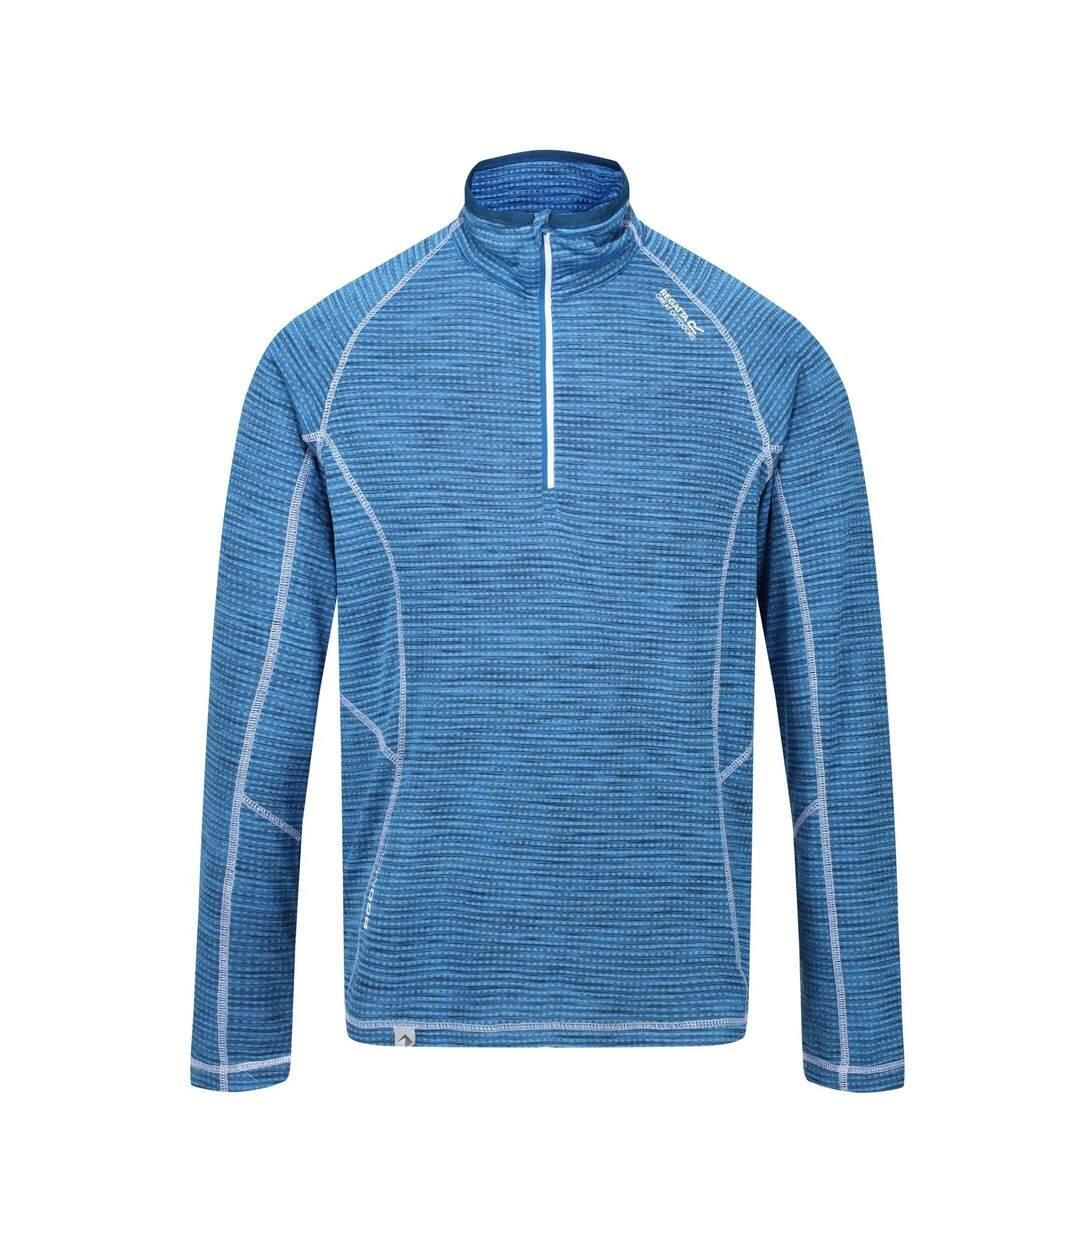 Regatta Mens Yonder Quick Dry Moisture Wicking Half Zip Fleece Jacket (Imperial Blue) - UTRG3786